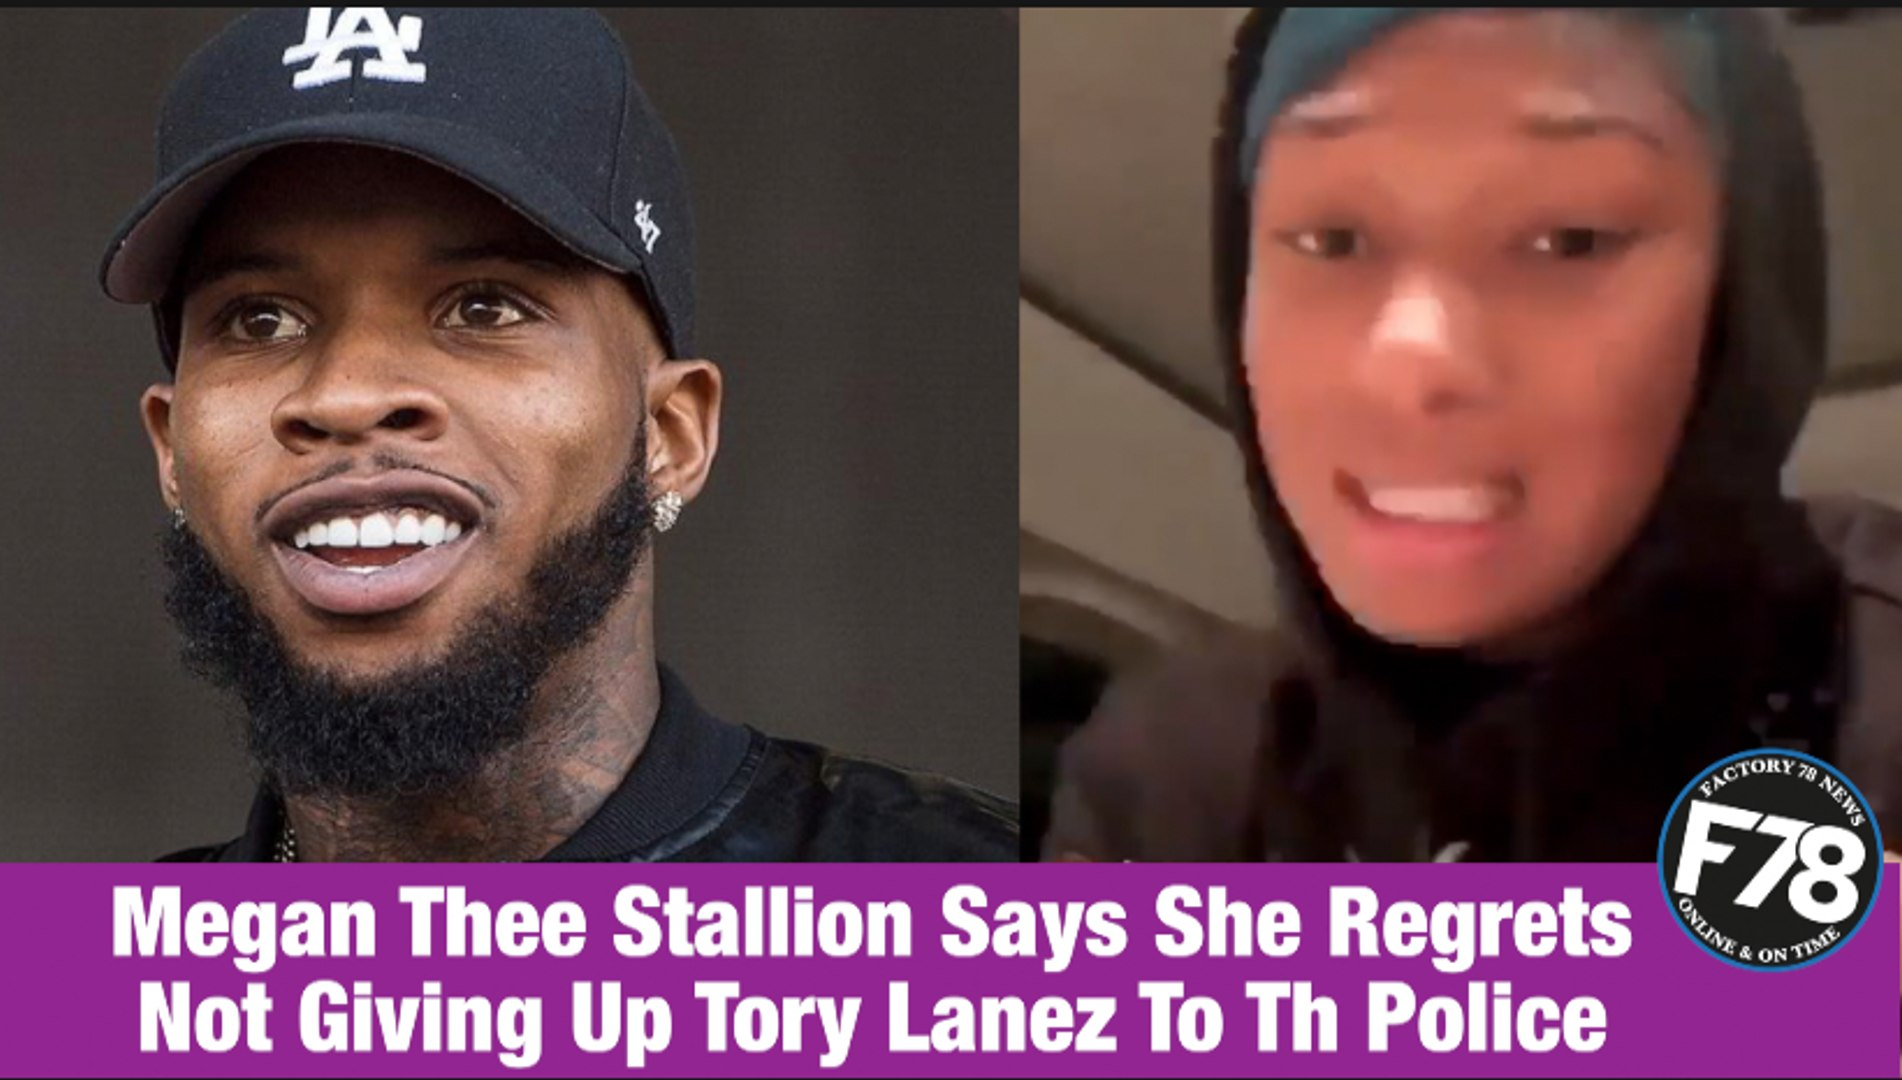 F78news Megan Thee Stallion Says She Regrets Not Giving Up Tory Lanez To The Police Megantheestallion Torylanez Kylejenna Cardib Wap Video Dailymotion